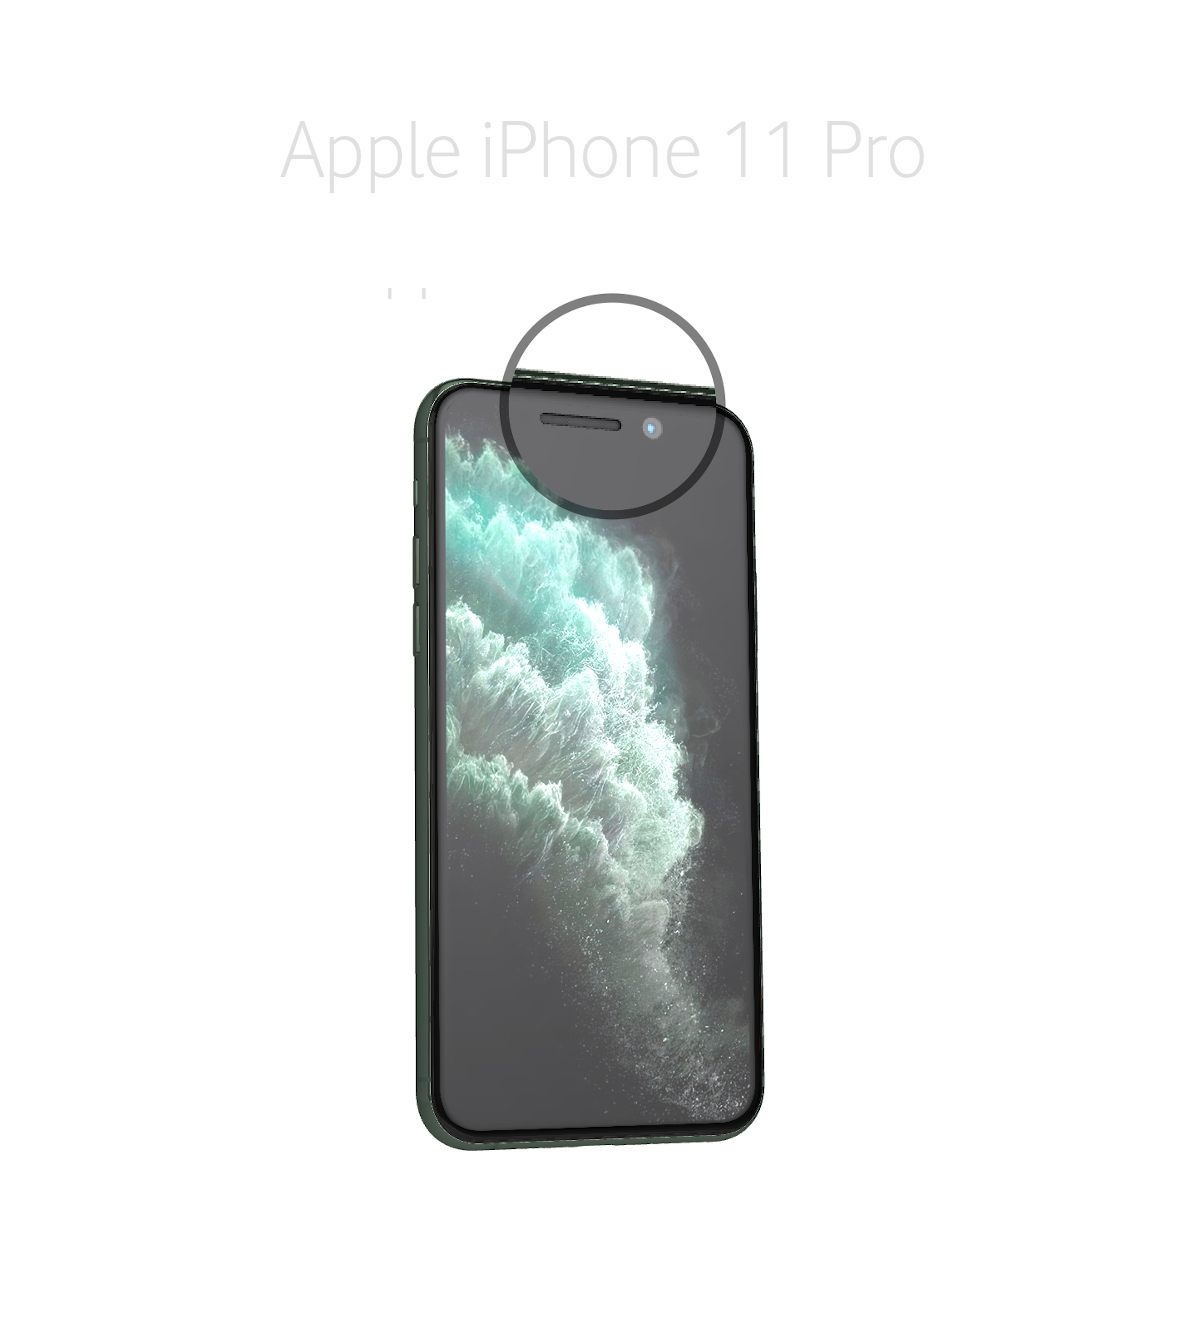 Laga samtalshögtalare iPhone 11 Pro